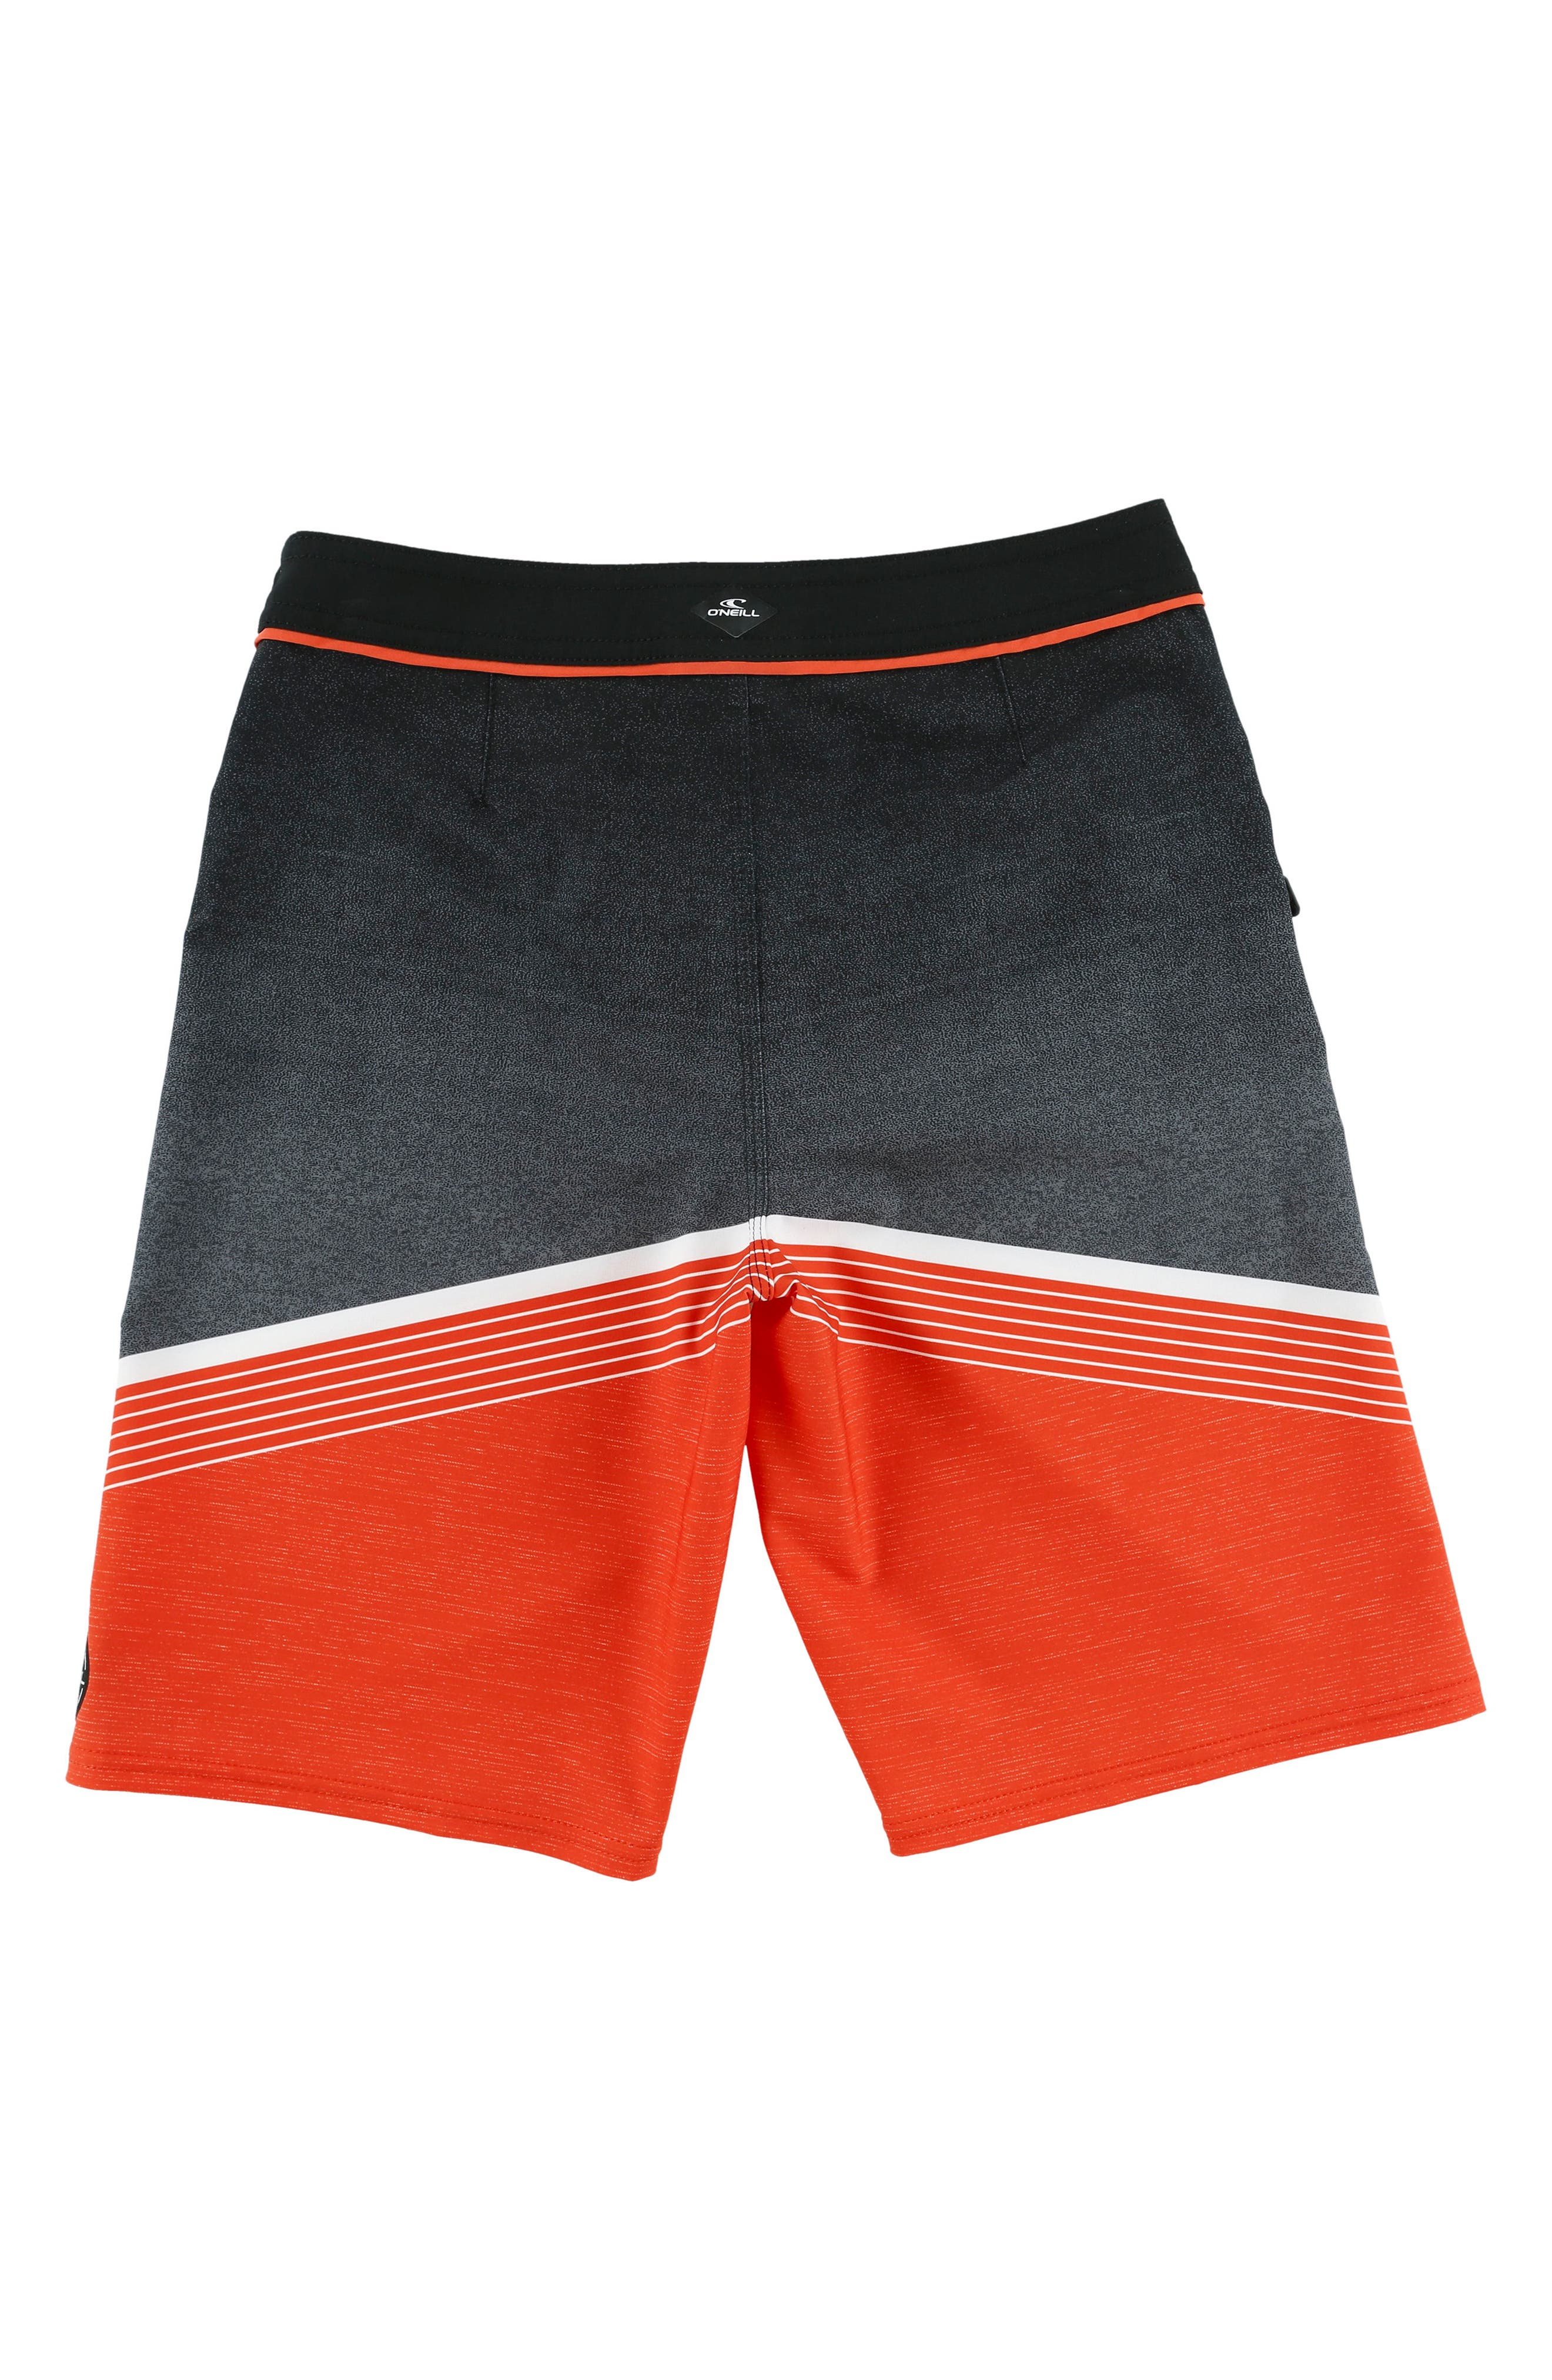 Hyperfreak Stretch Board Shorts,                             Alternate thumbnail 15, color,